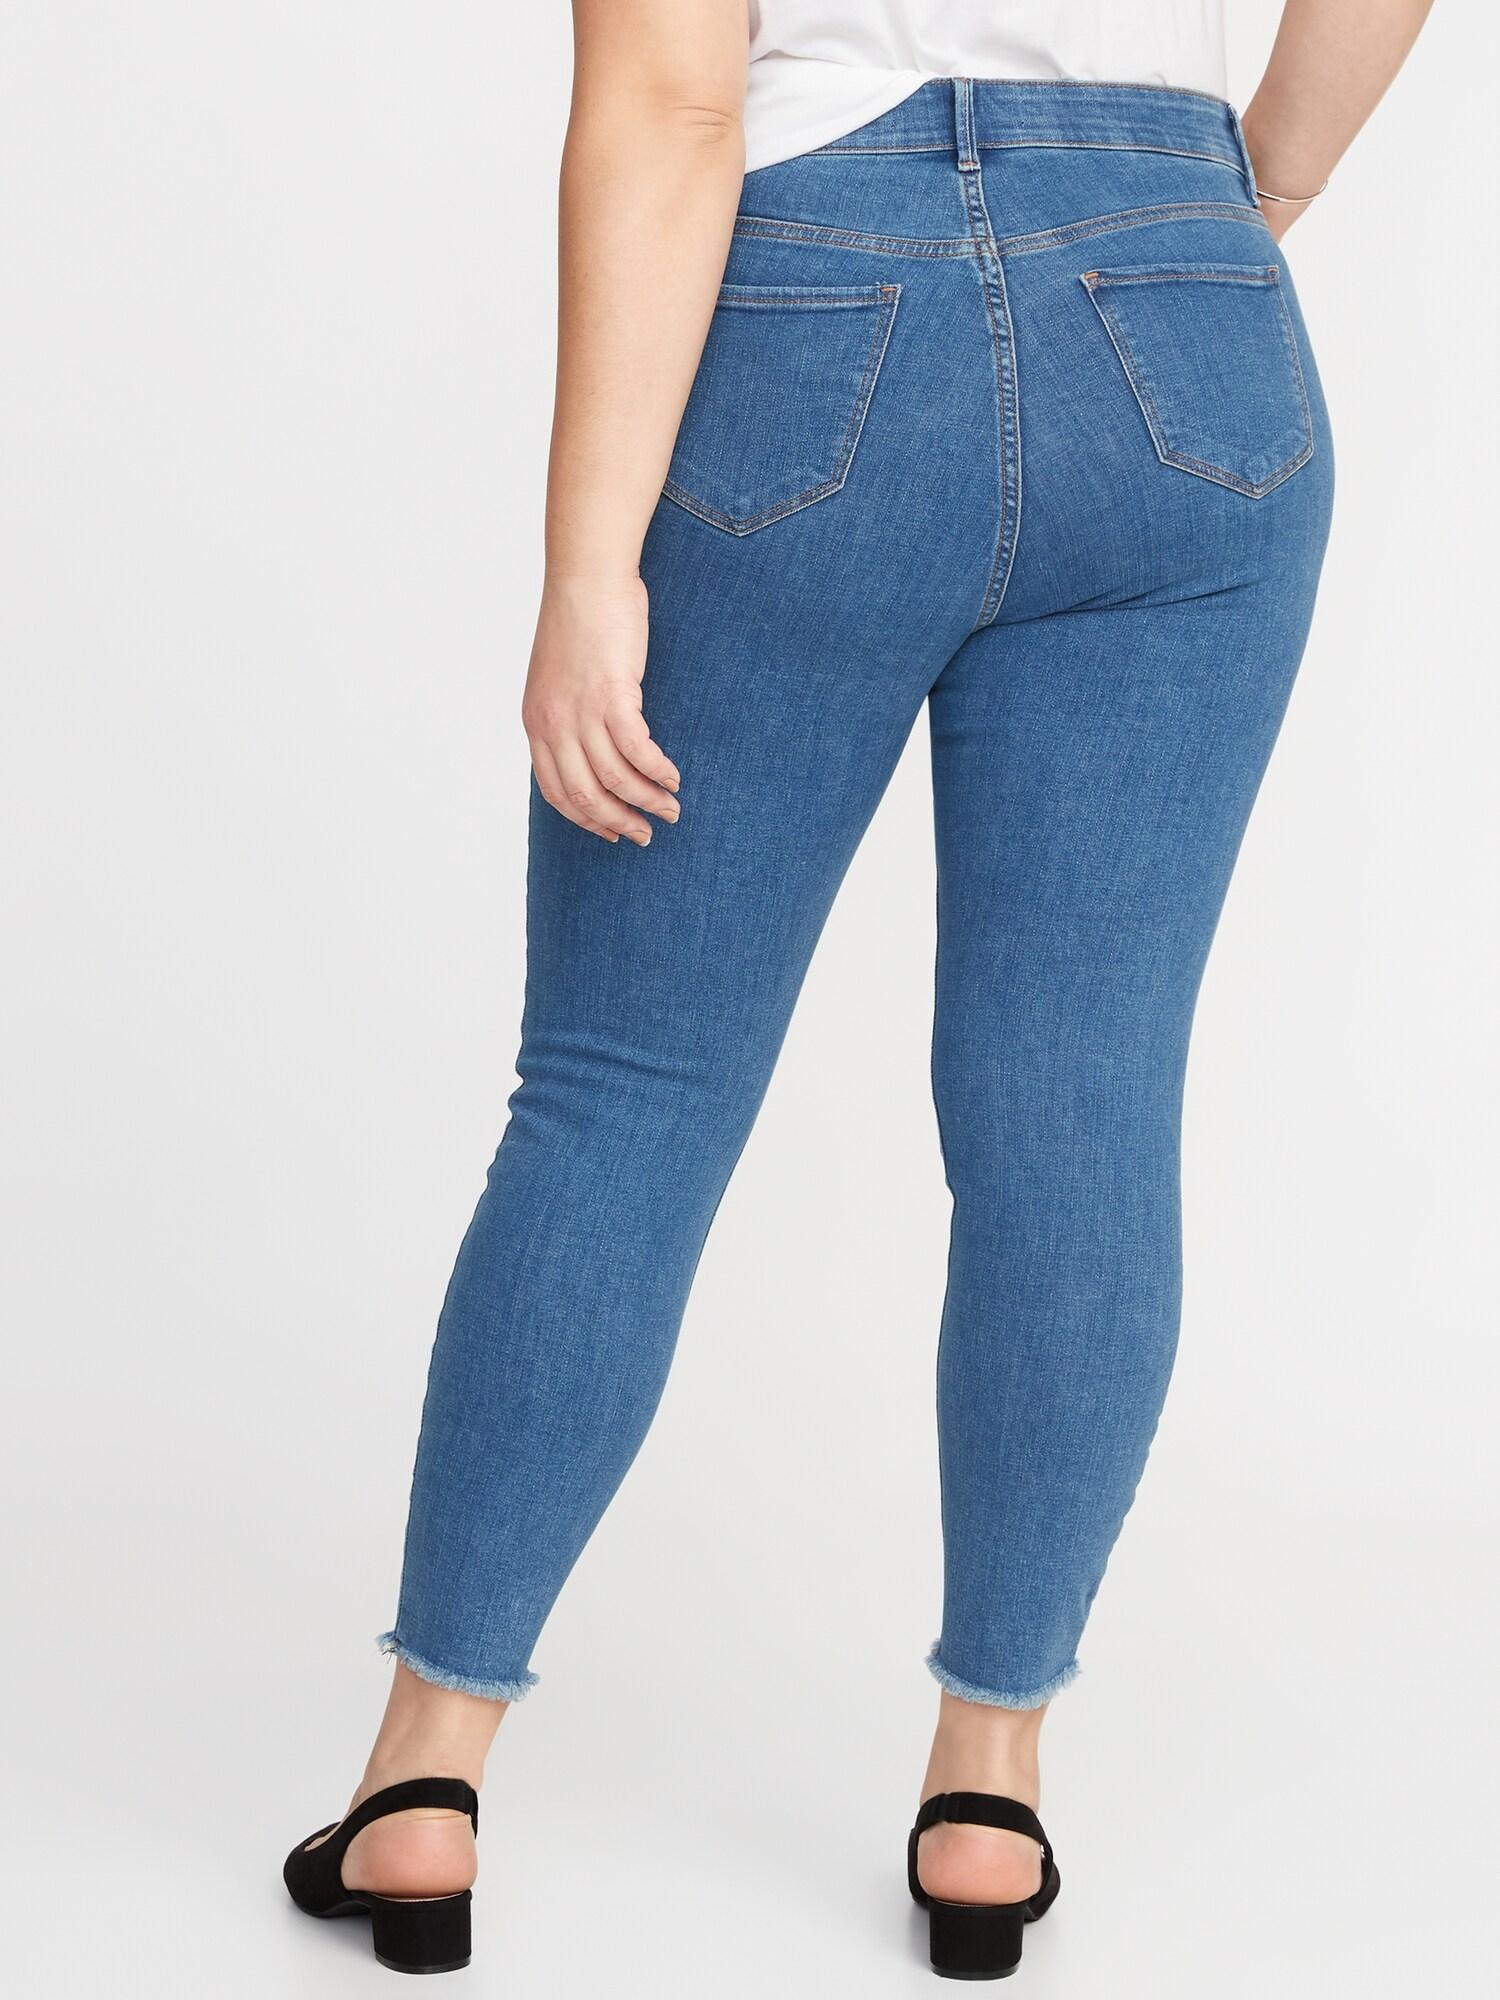 a5dca3a8f99 High-Rise Secret-Slim Pockets + Waistband Rockstar Plus-Size Super Skinny  Ankle Jeans